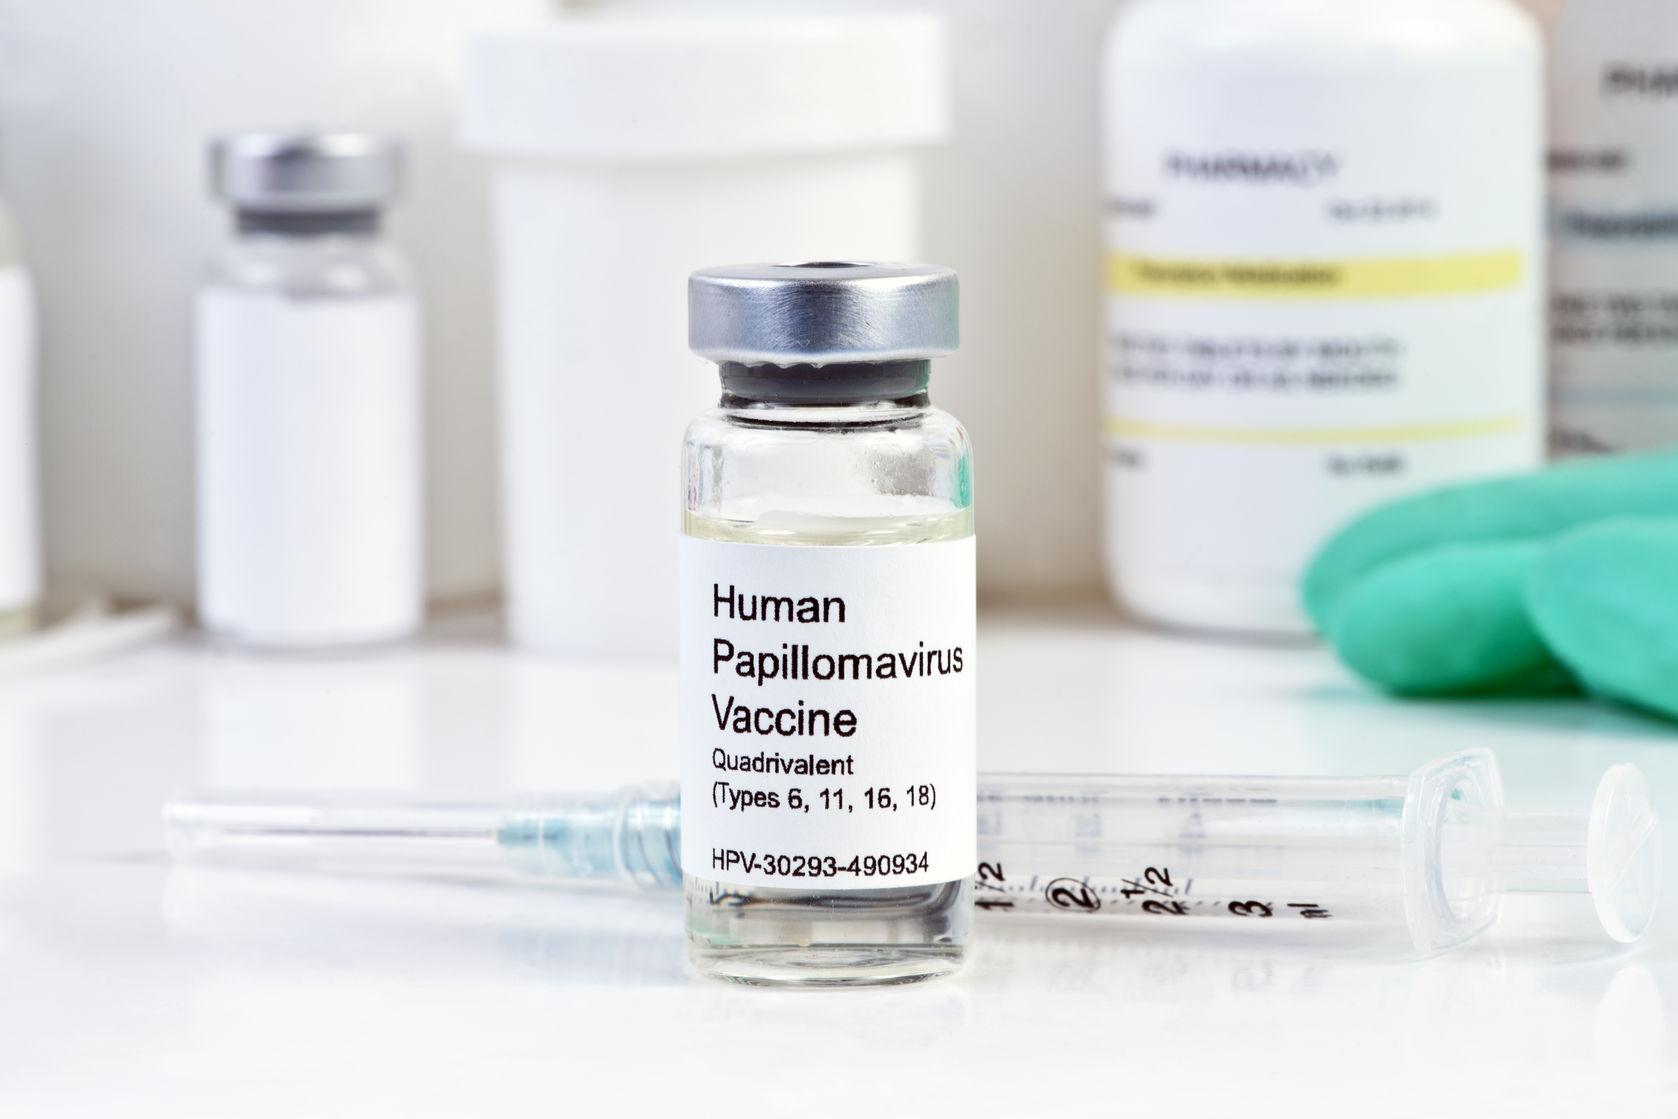 Hpv vaksine. Vaccinul care m-a străpuns - Scena 9 - Hpv vaksine gardasil 9